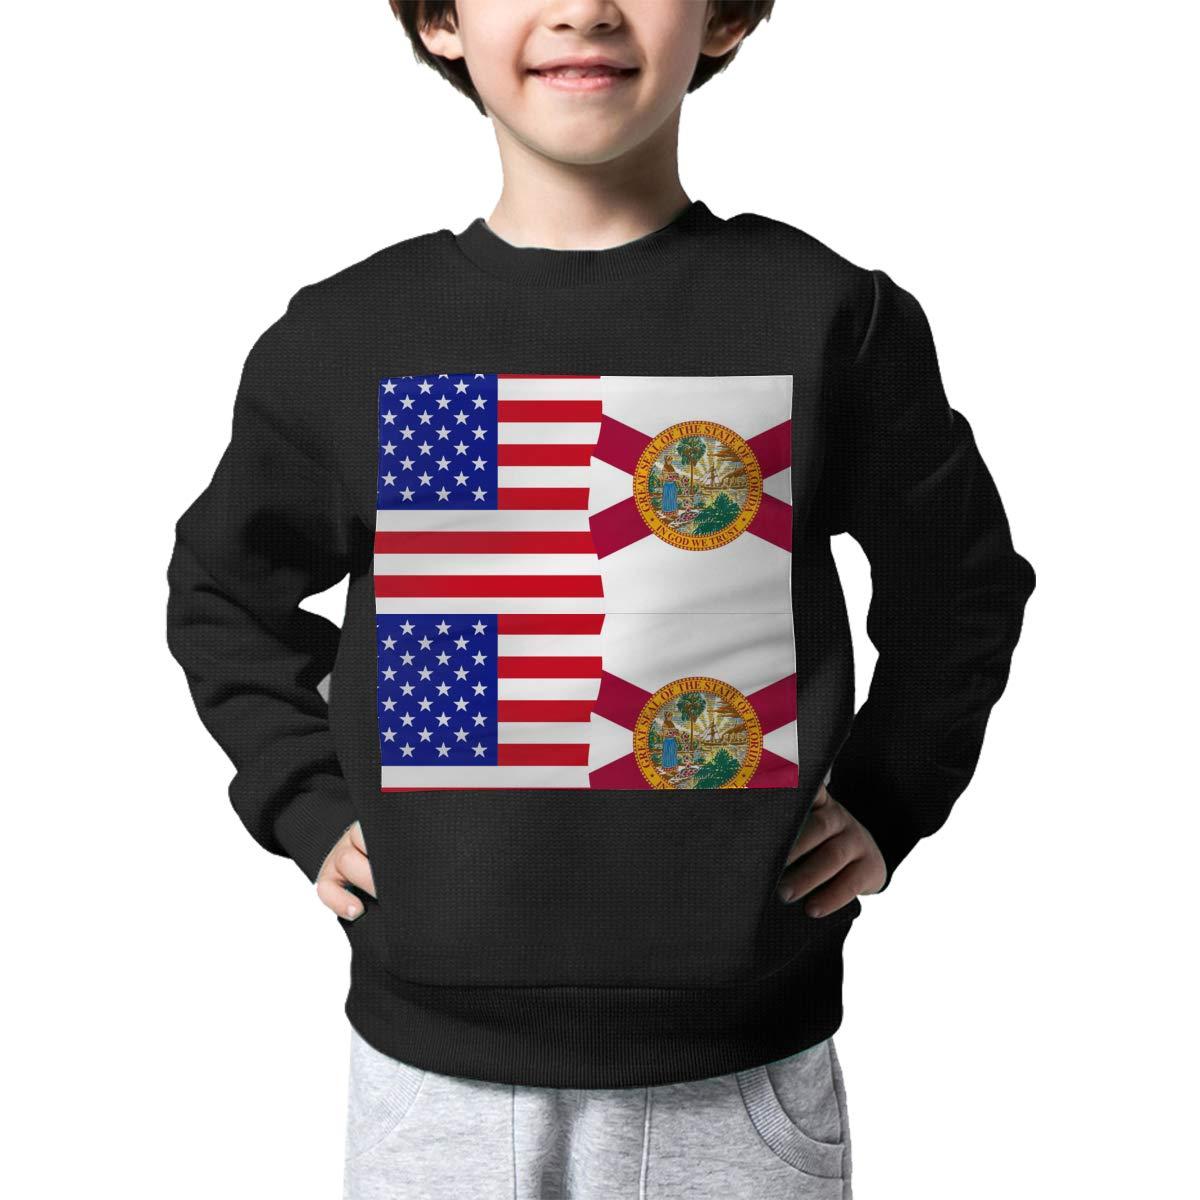 NJKM5MJ Boys Girls Half USA Half Florida Flag Lovely Sweaters Soft Warm Childrens Sweater